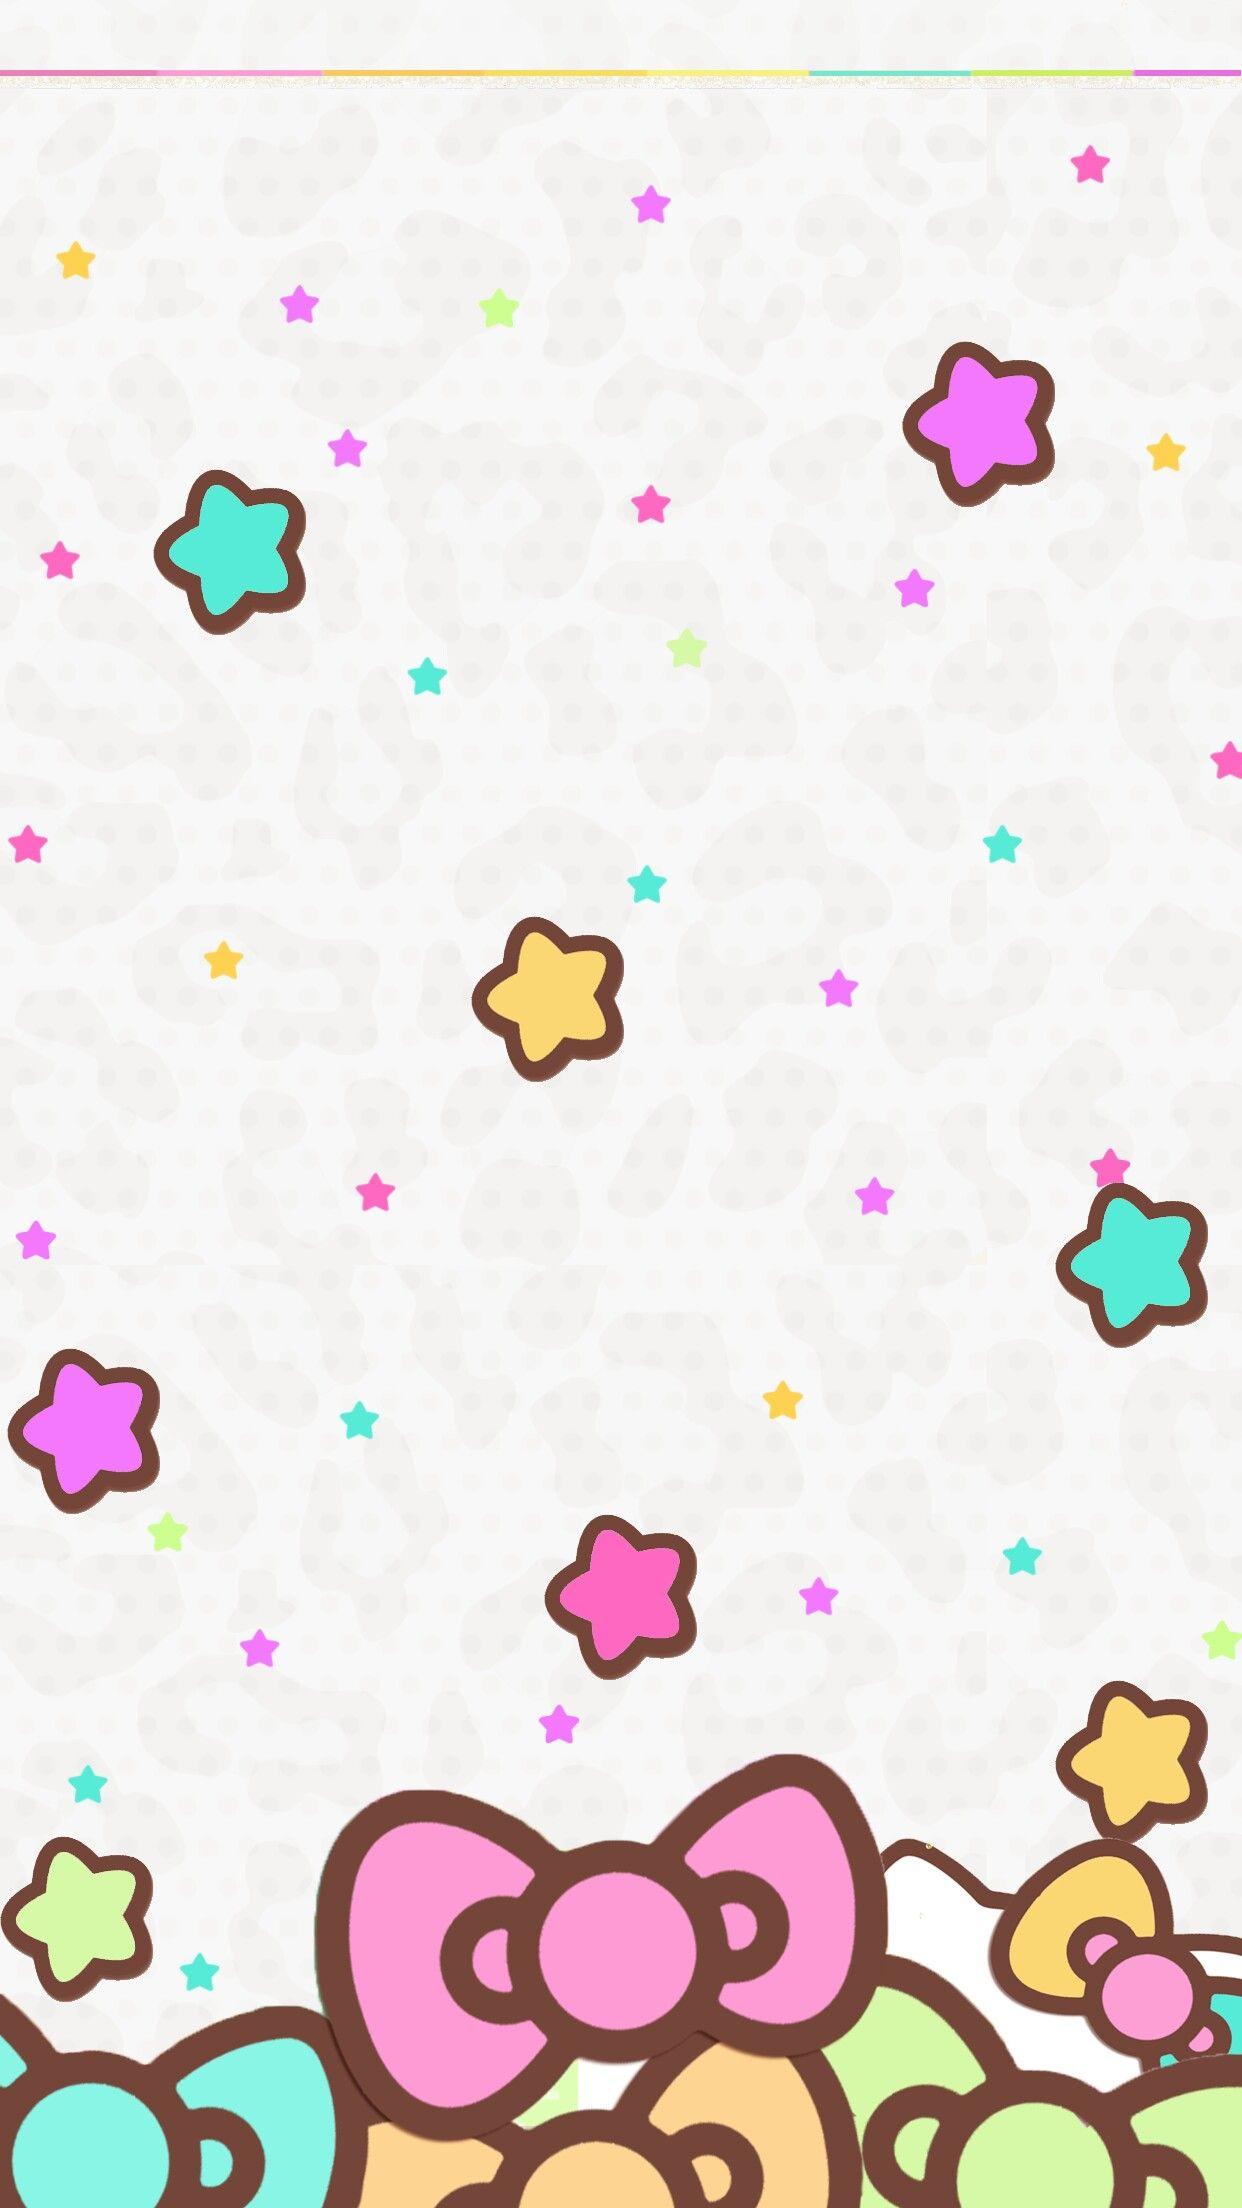 Good Wallpaper Hello Kitty Ribbon - 9fb27bd51e0c1847c27cd12022c62a5a  Picture_535259.jpg